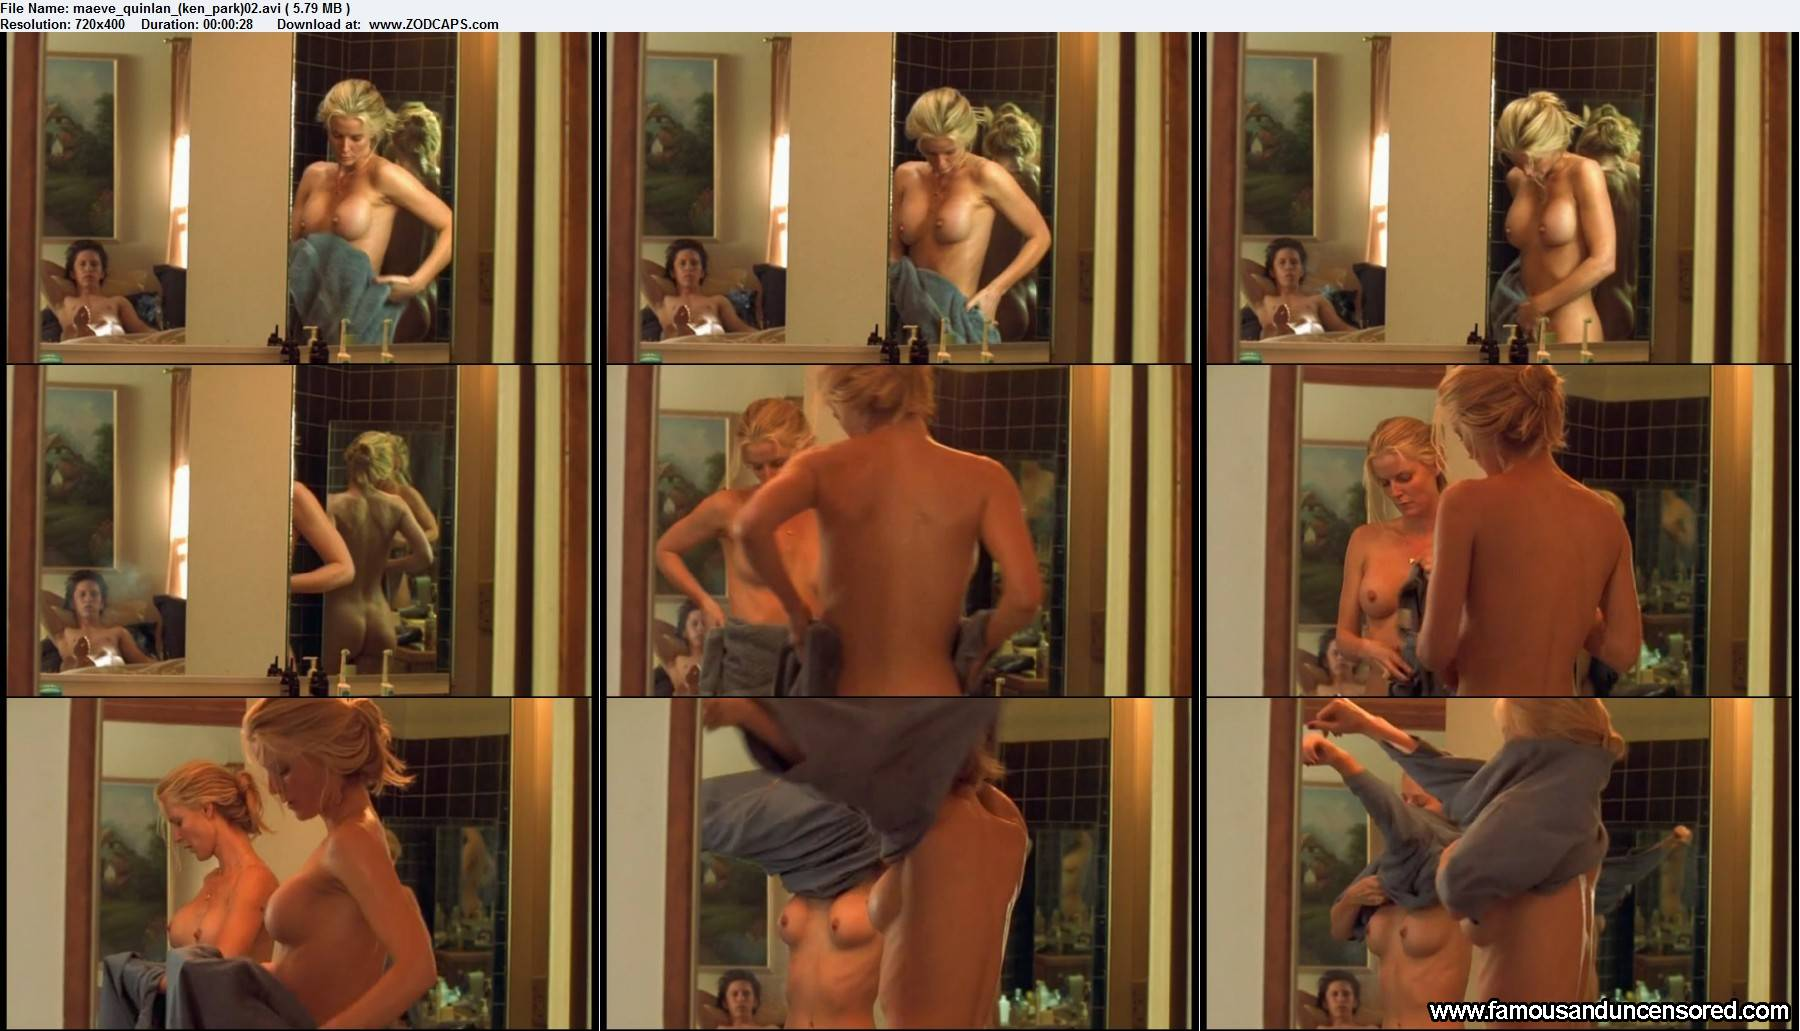 Maeve quinlan nude photos free pics